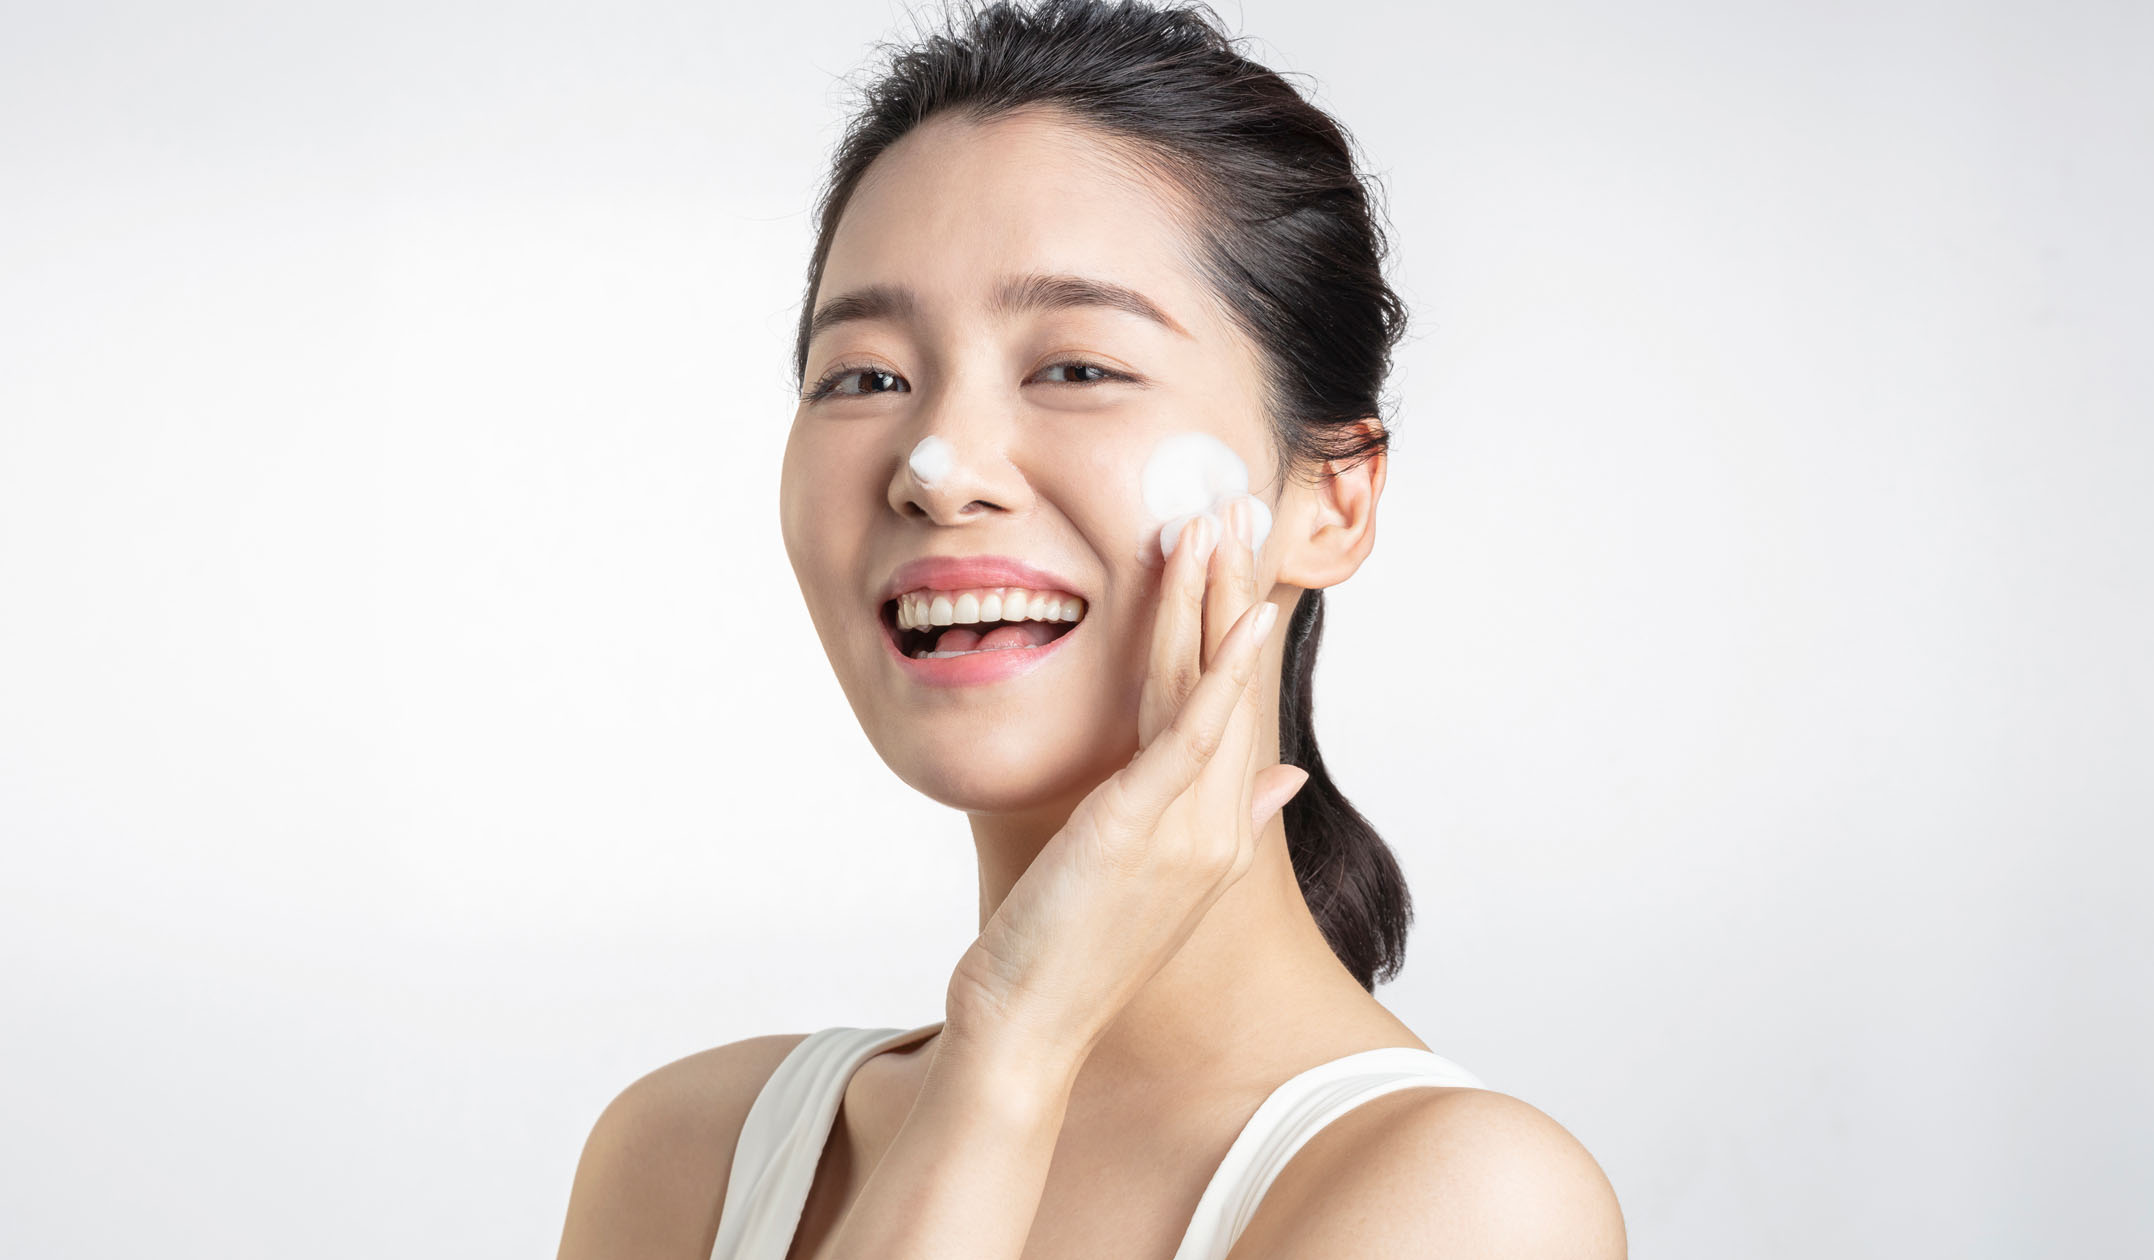 dermatologists-reveal-desktop-hero-image.jpg